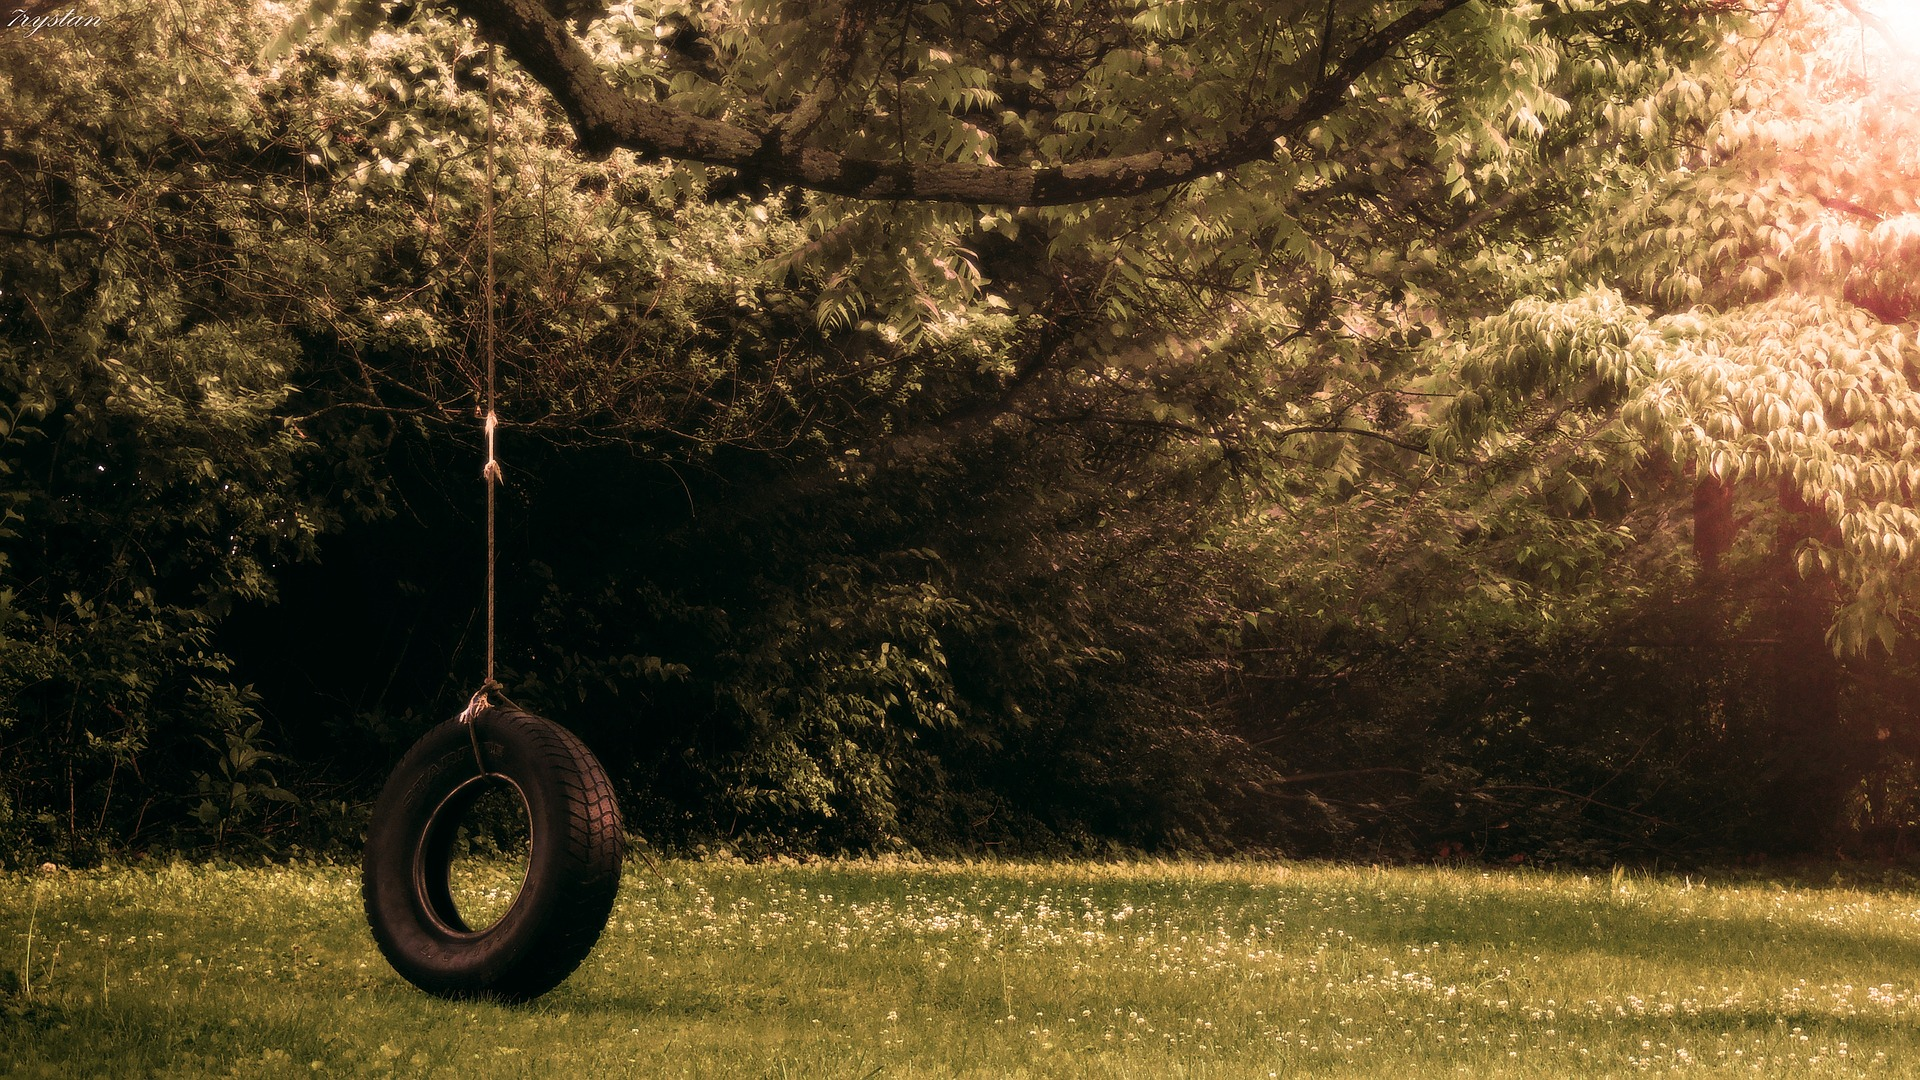 tireswing-2420483_1920